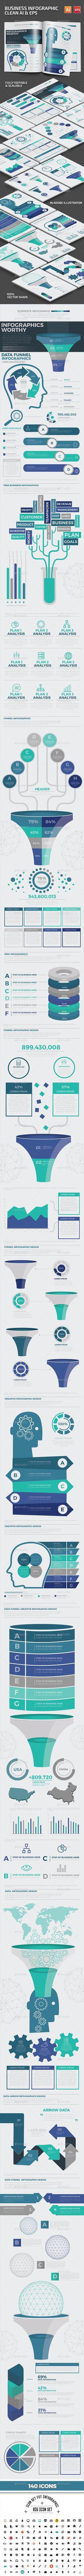 Blue Analysis Infographics Design By Mamanamsai DesignFiles AI 2 Files For Illustrator CS EPS